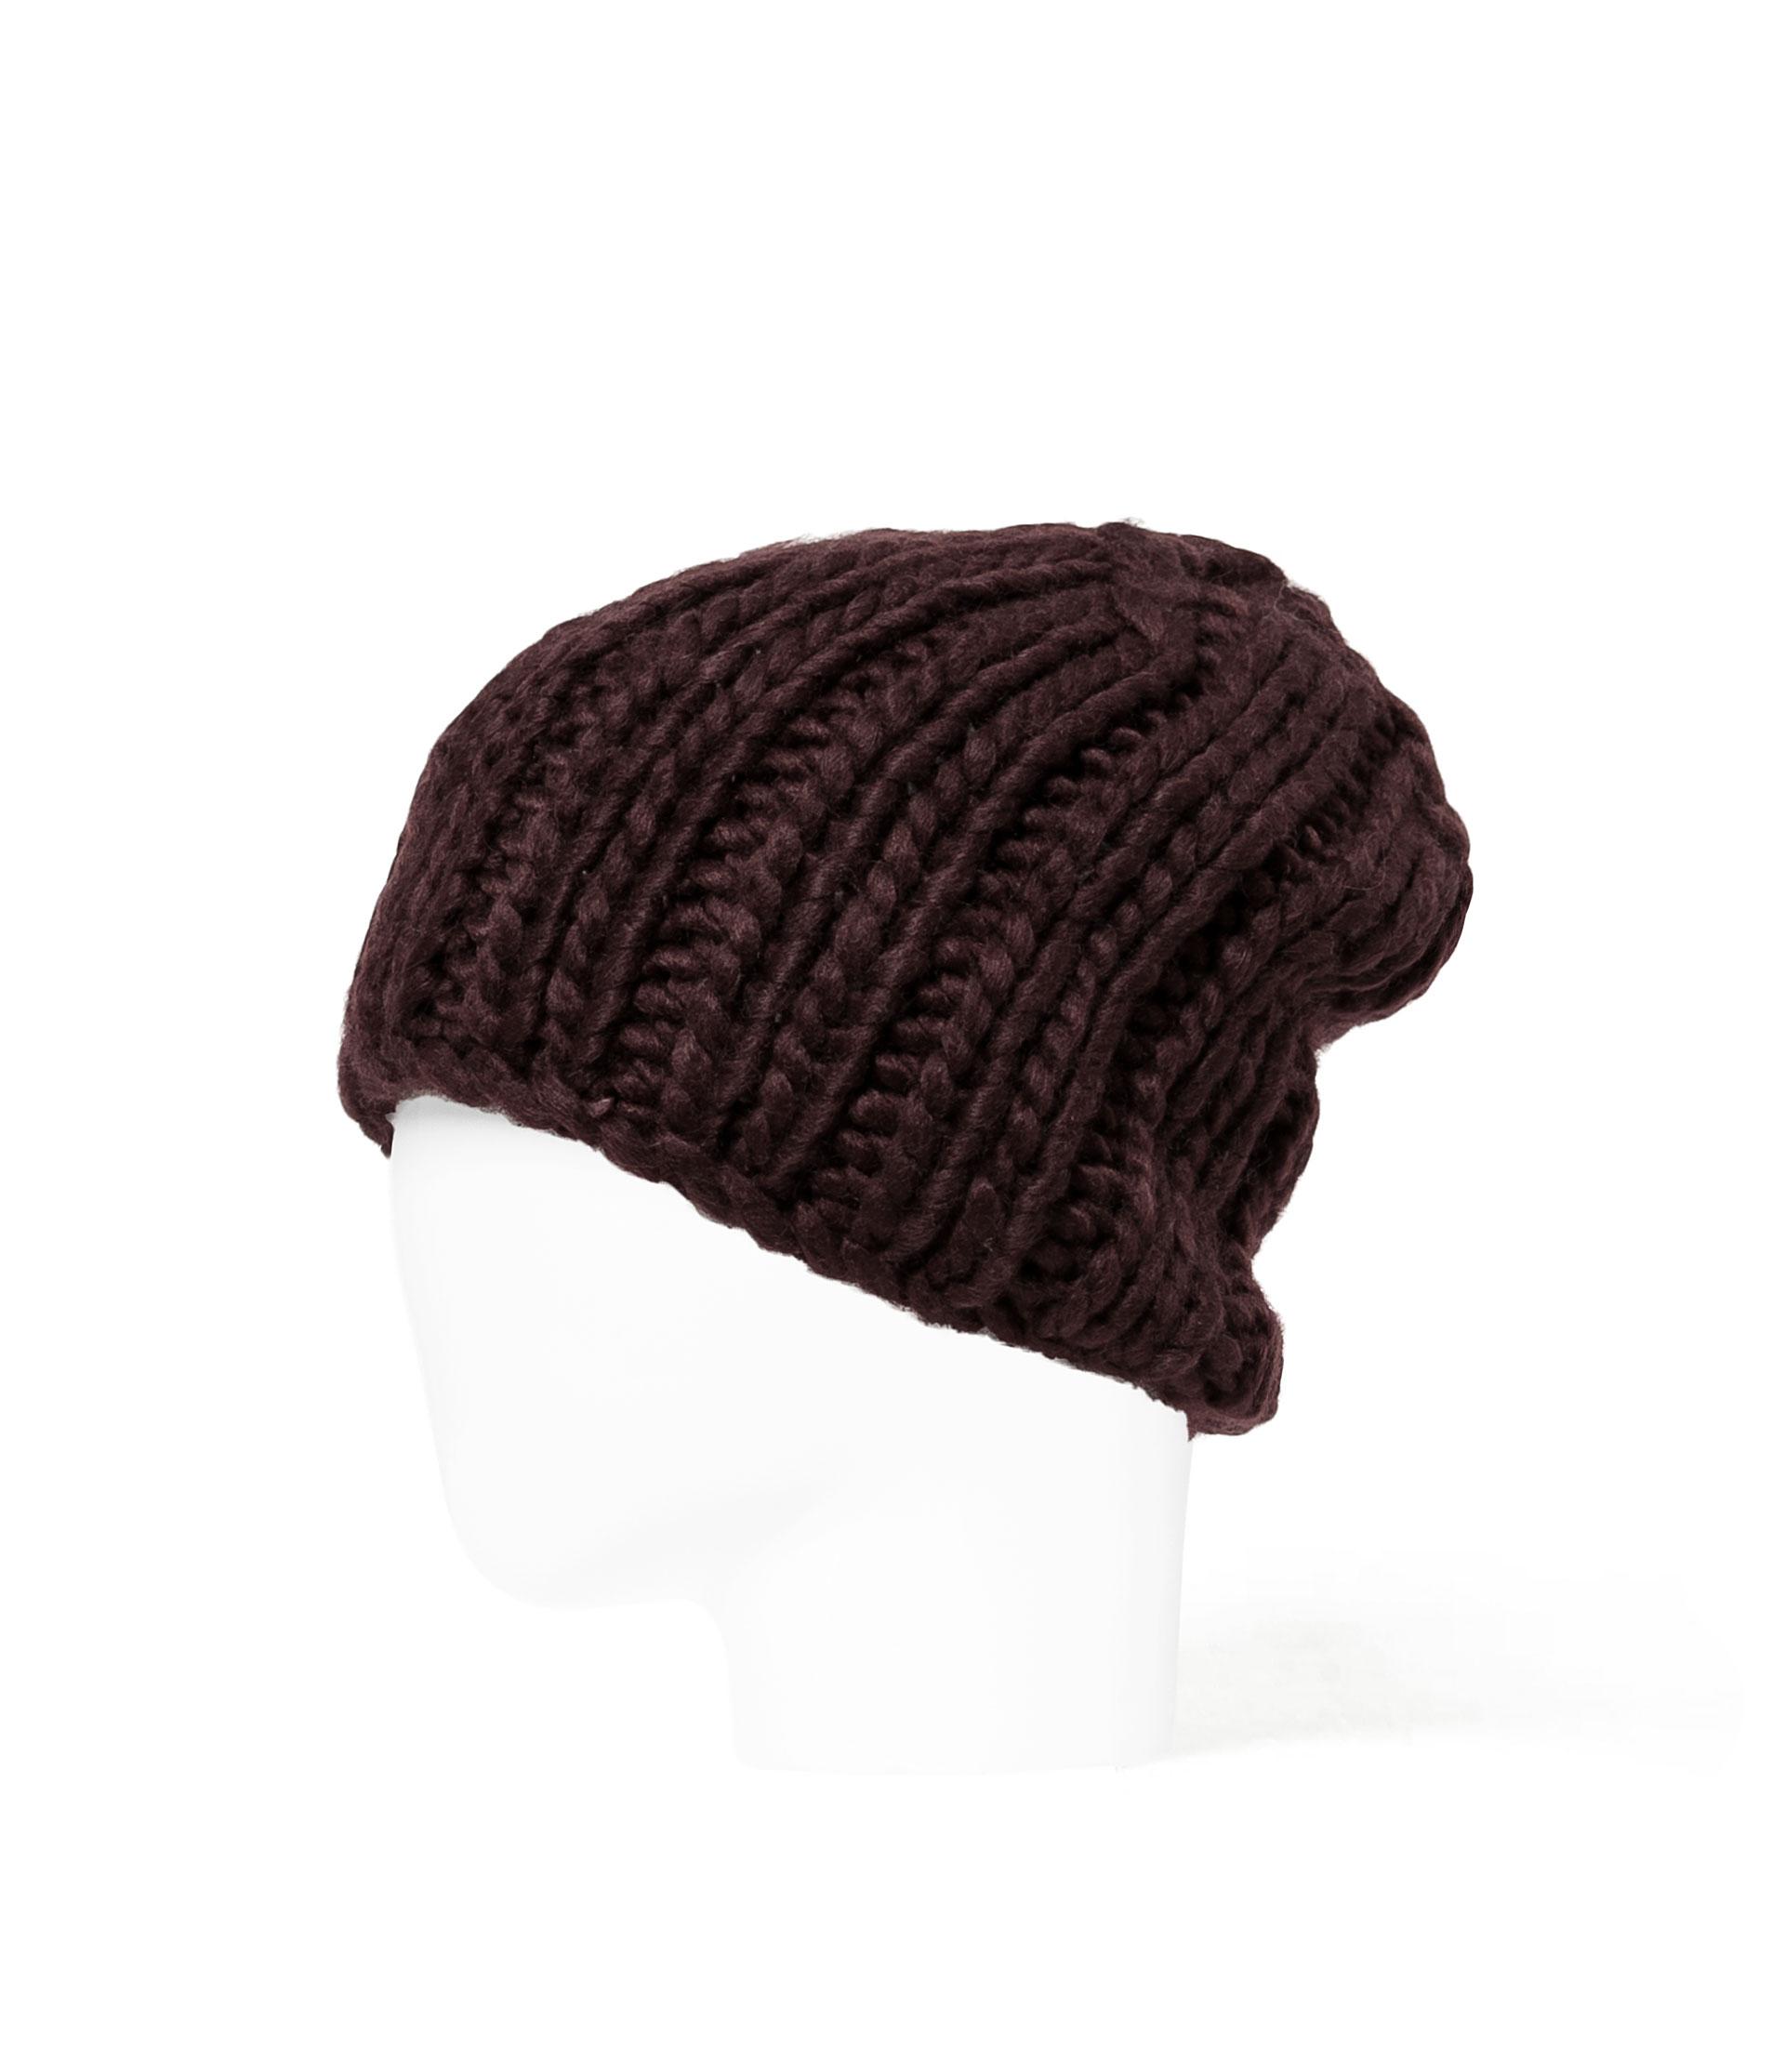 Zara Chunky Knit Beanie Hat In Brown For Men Lyst